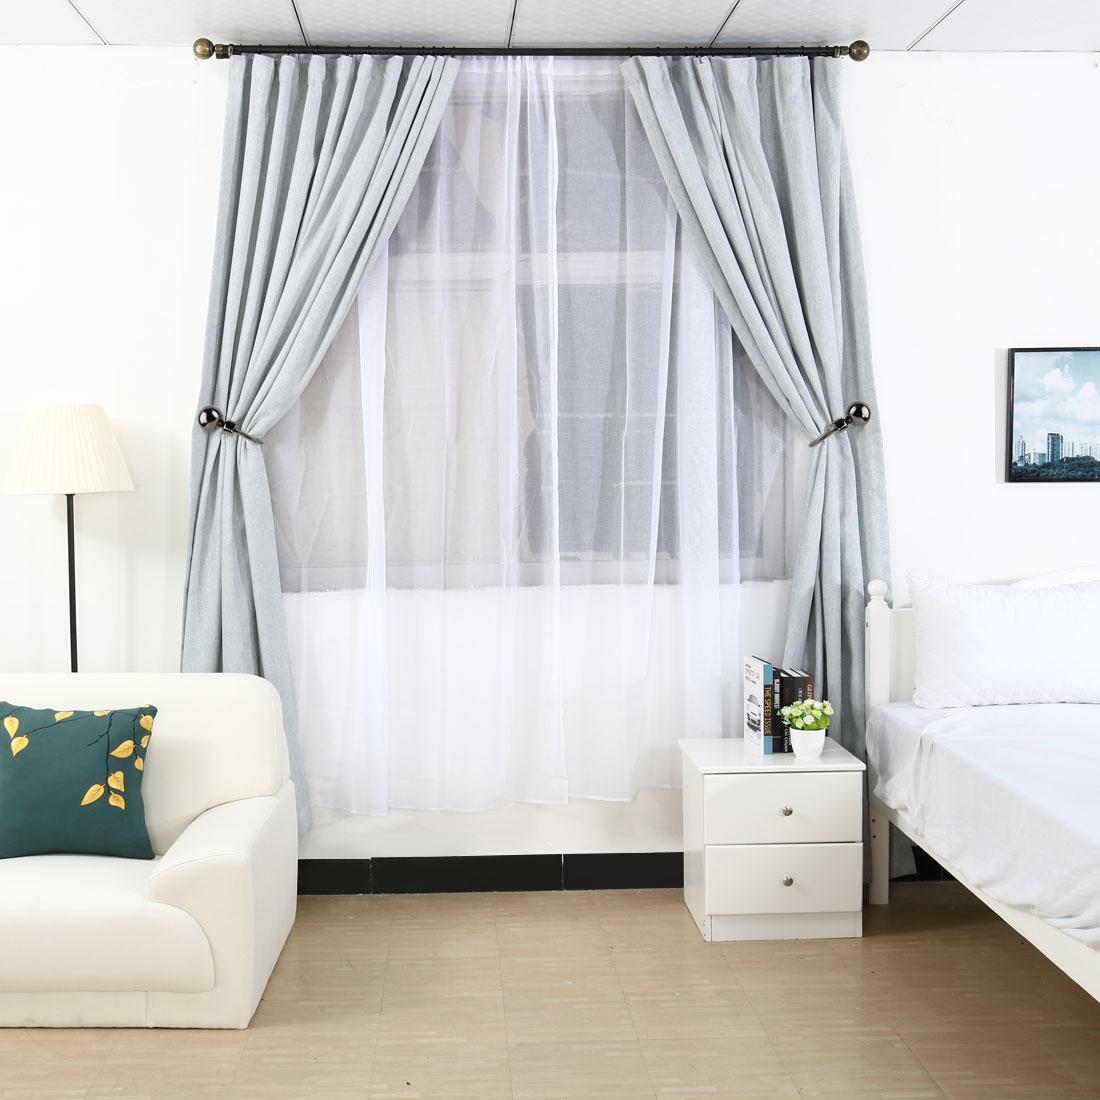 metal window drapery tie backs curtain